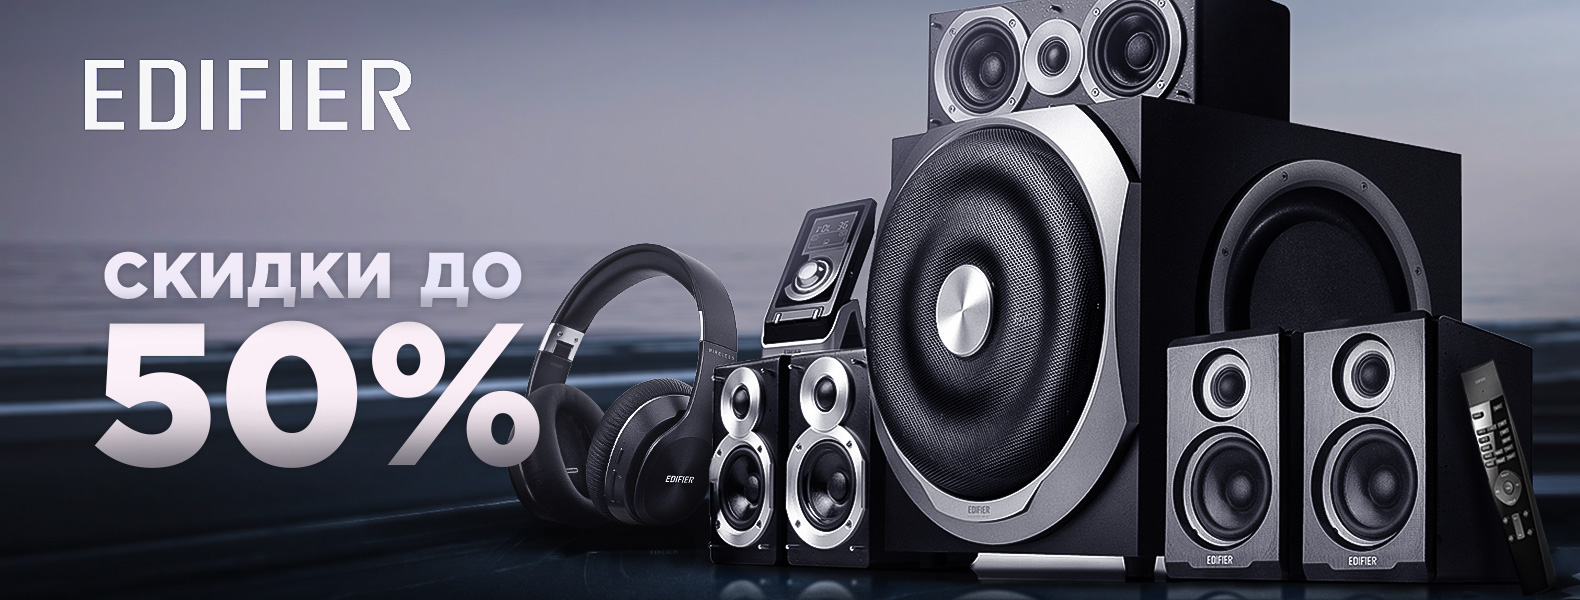 Скидки на акустику и гарнитуры Edifier до 50%